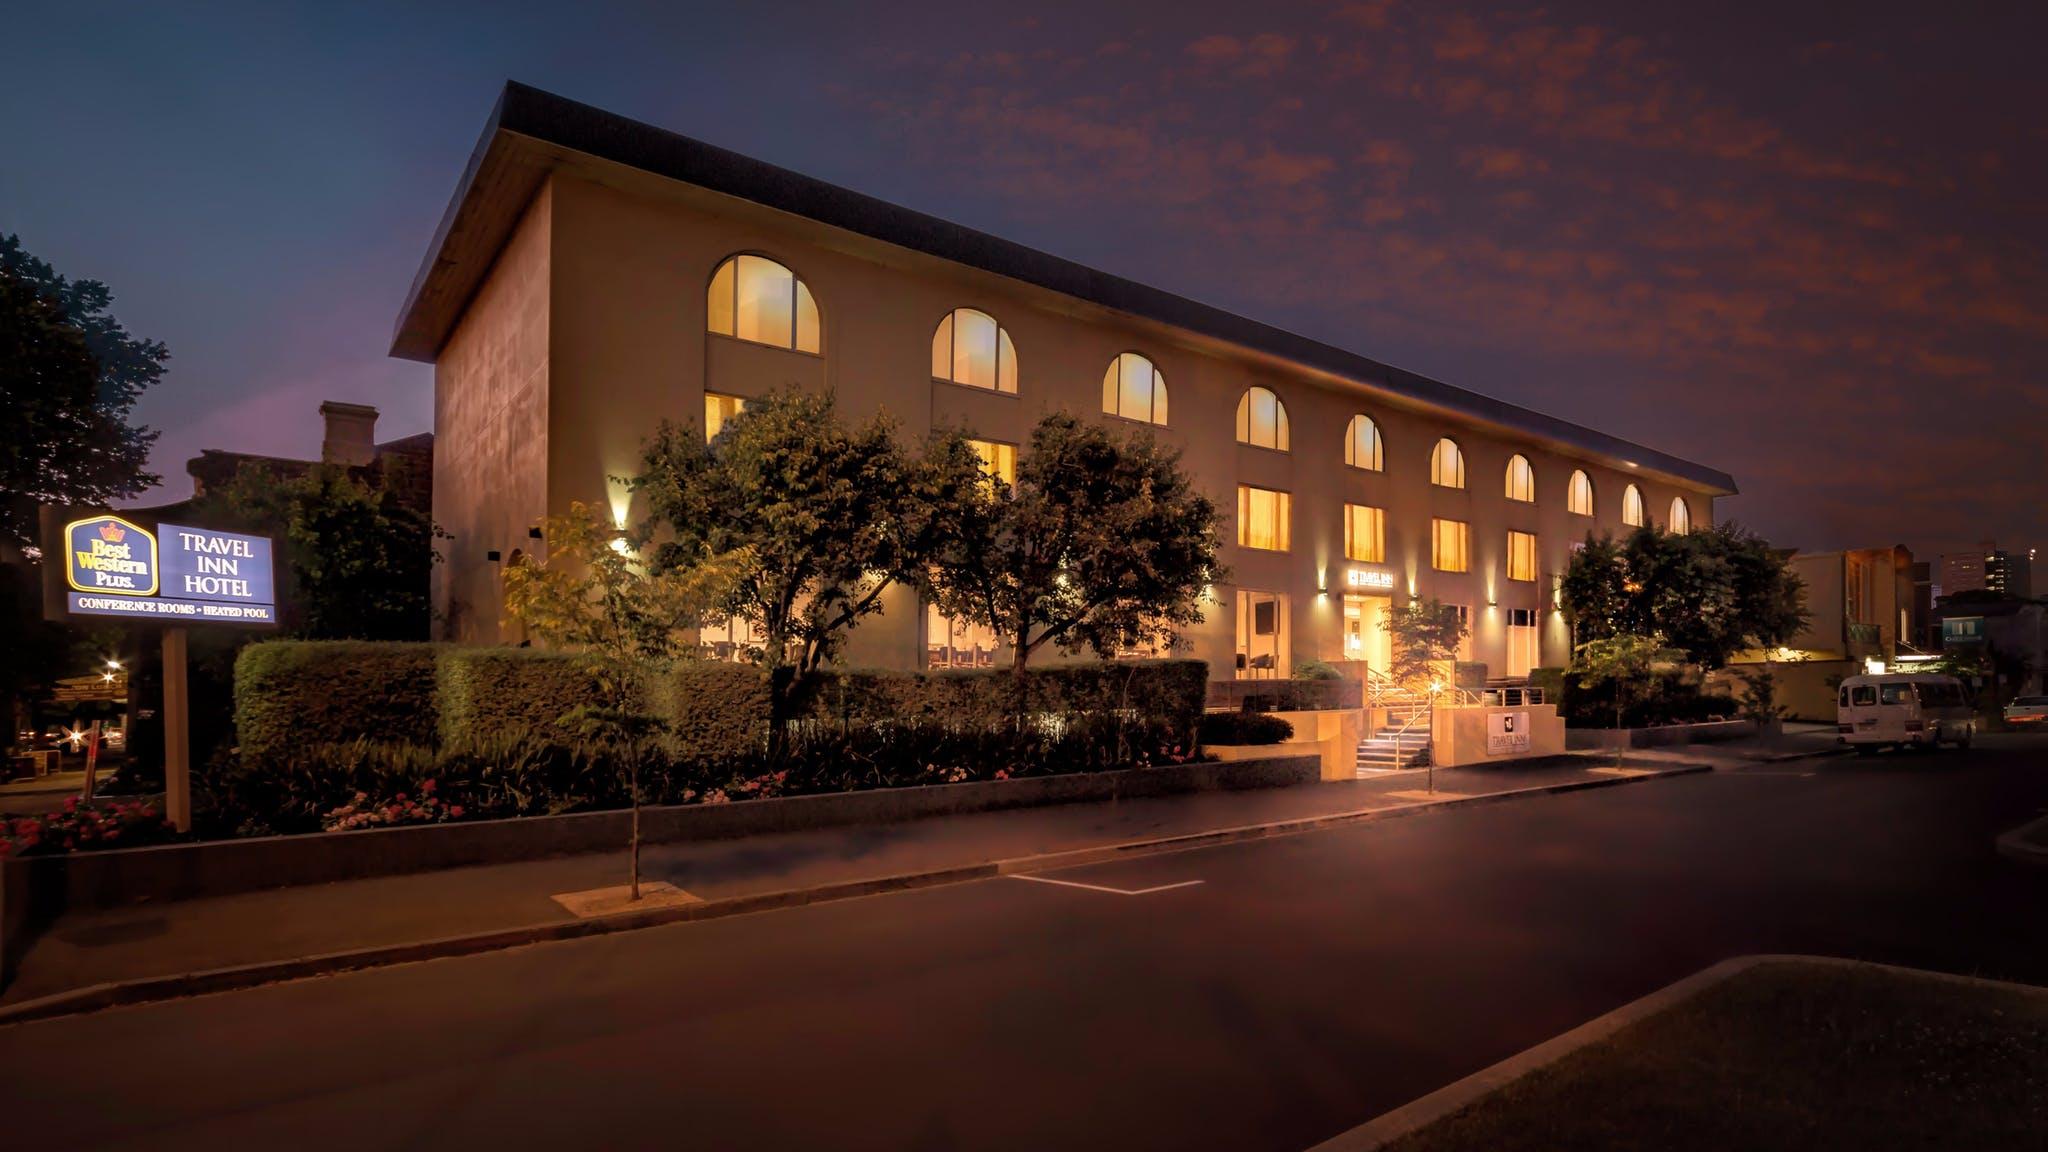 The Best Western Plus Travel Inn